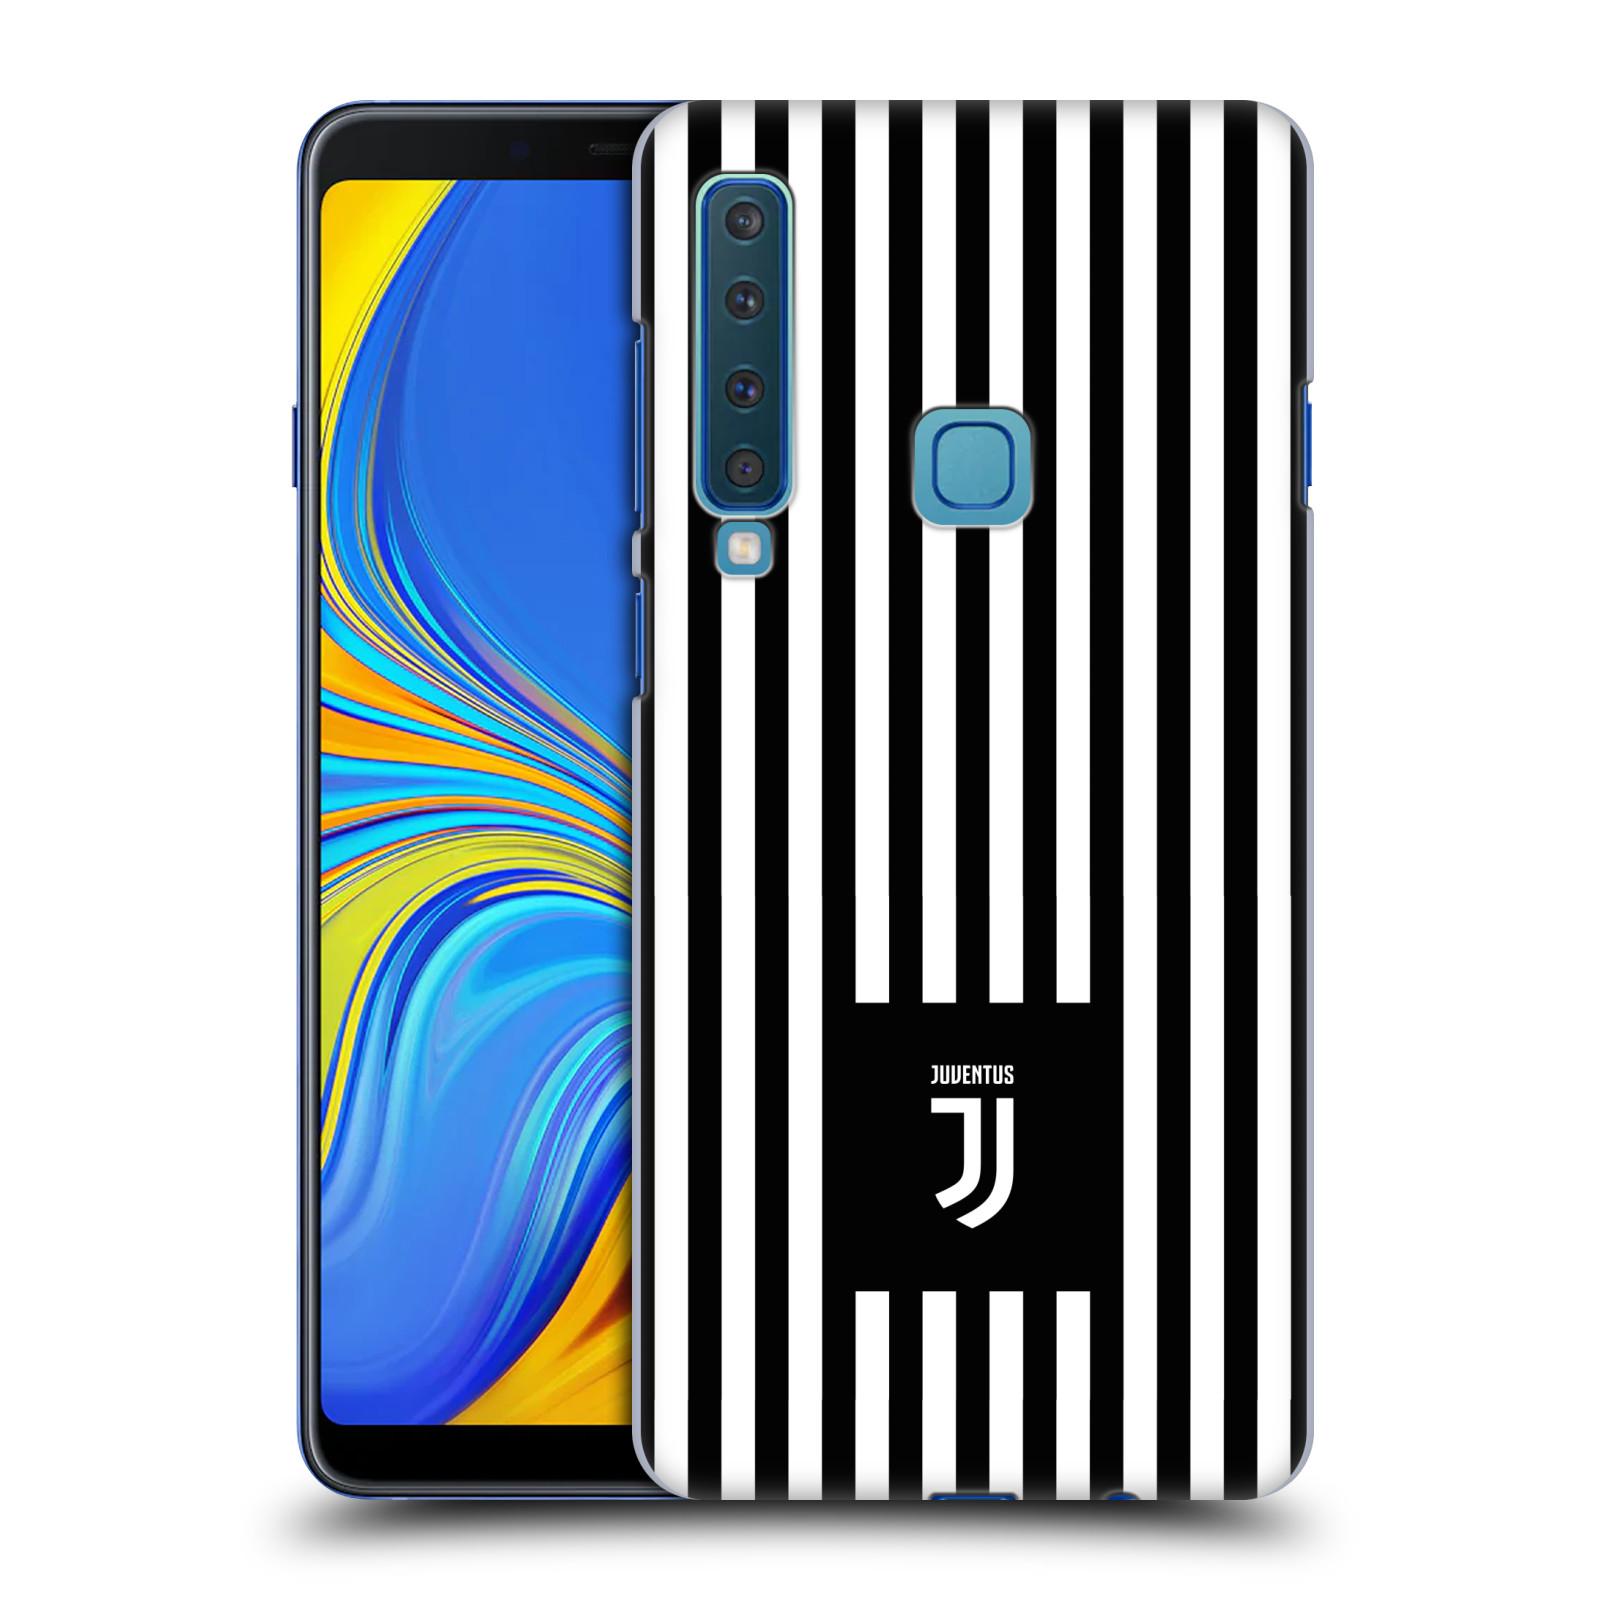 Plastové pouzdro na mobil Samsung Galaxy A9 (2018) - Head Case - Juventus FC - Nové logo - Pruhy